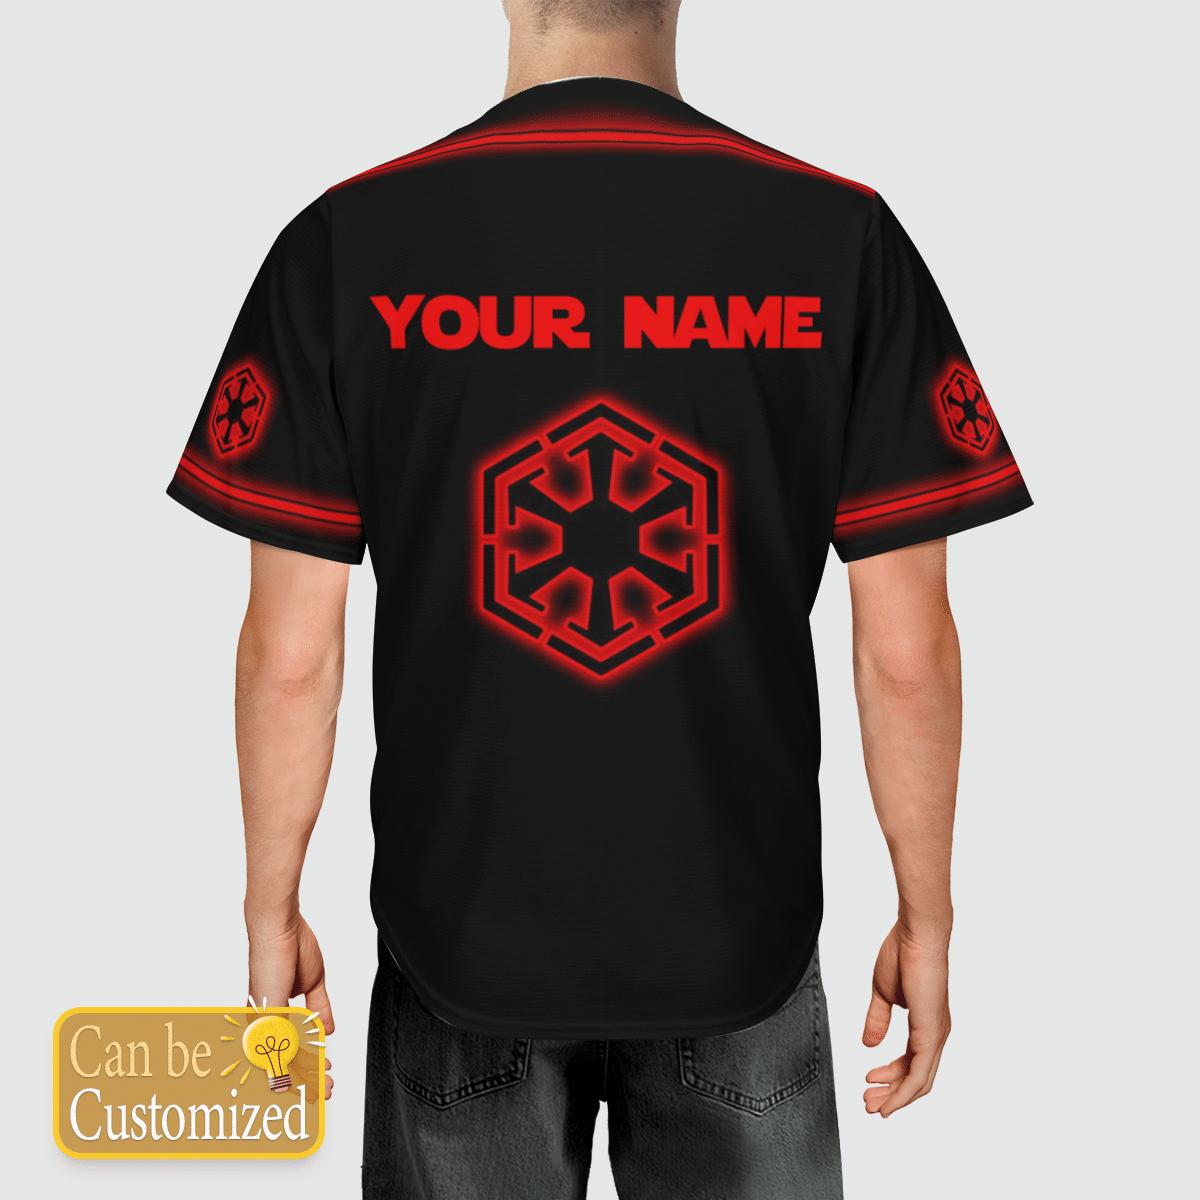 Sith Empire custom name baseball shirt 3